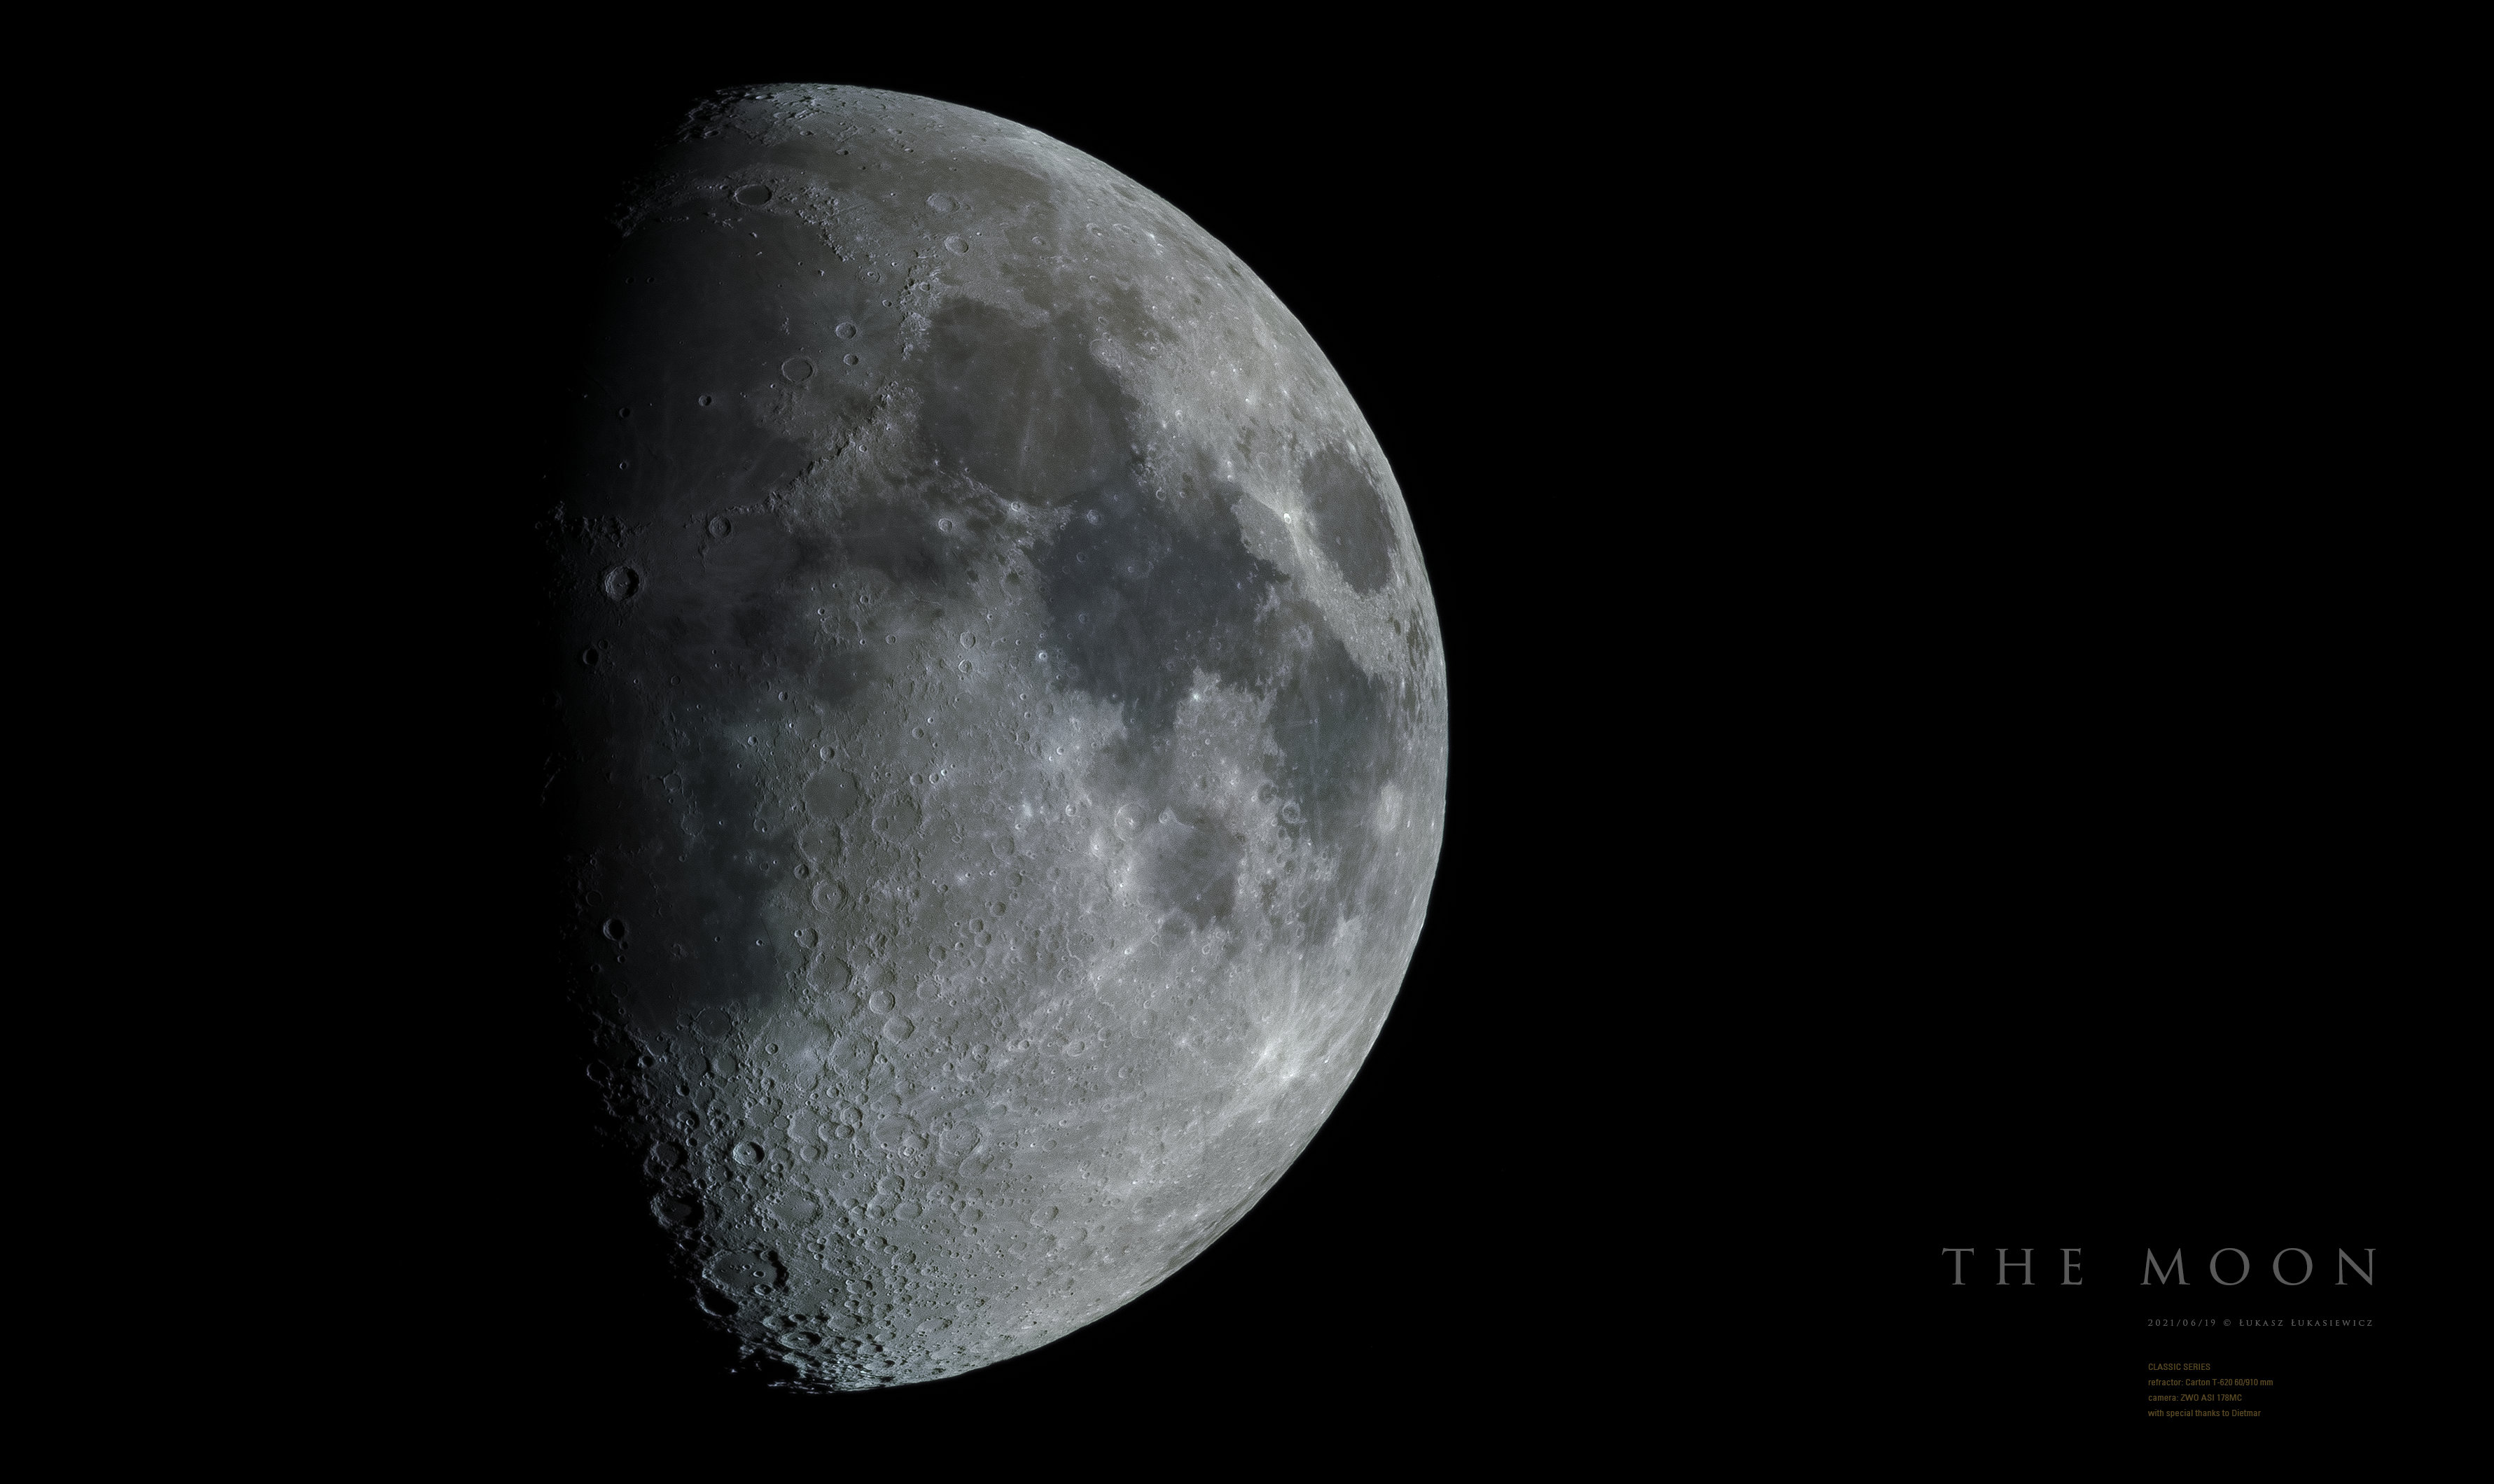 THE-MOON-2021-06-19c.jpg